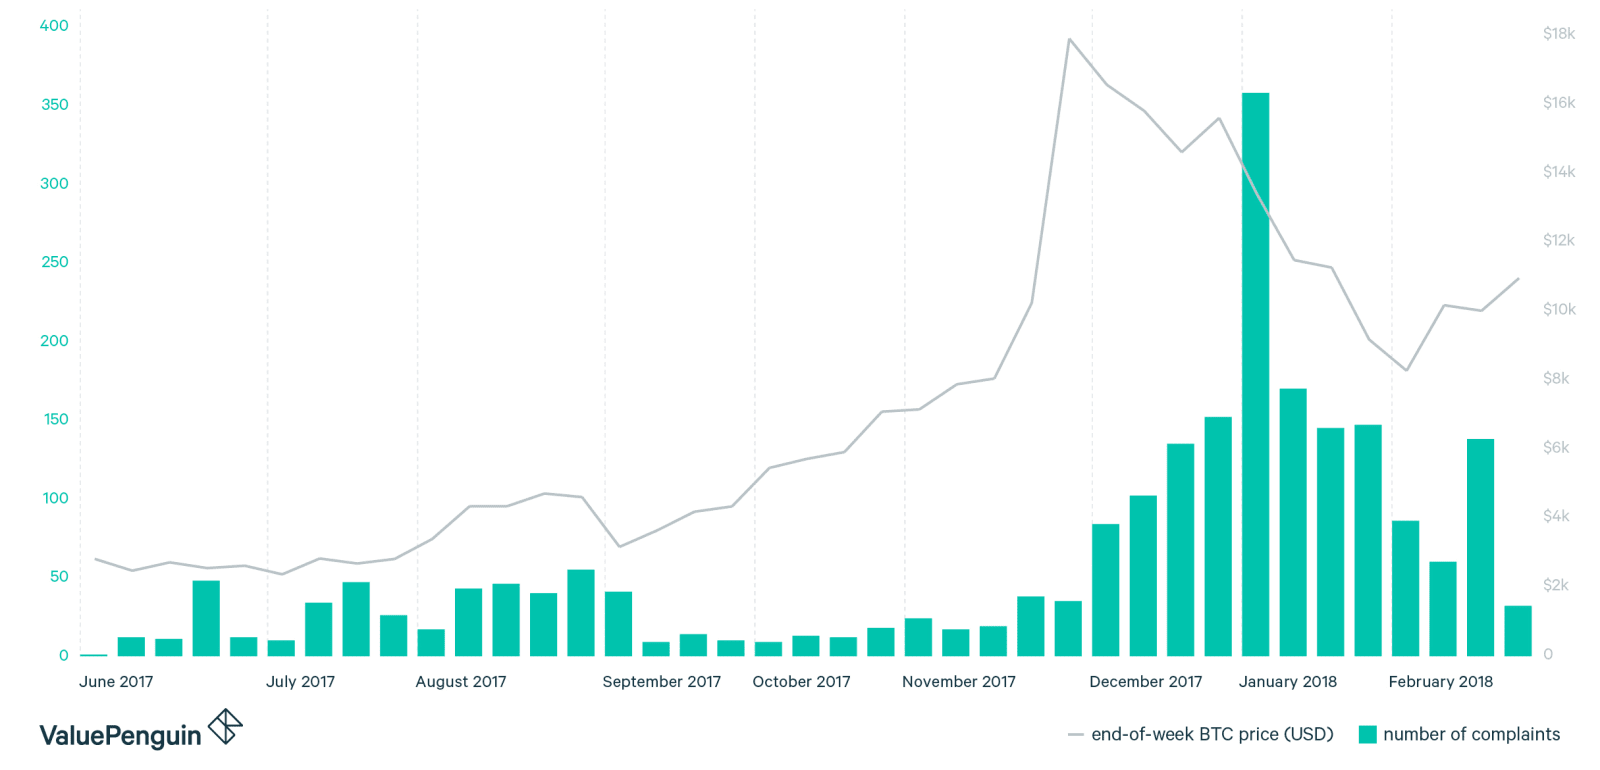 Coinbase Complaints vs Bitcoin Pricing